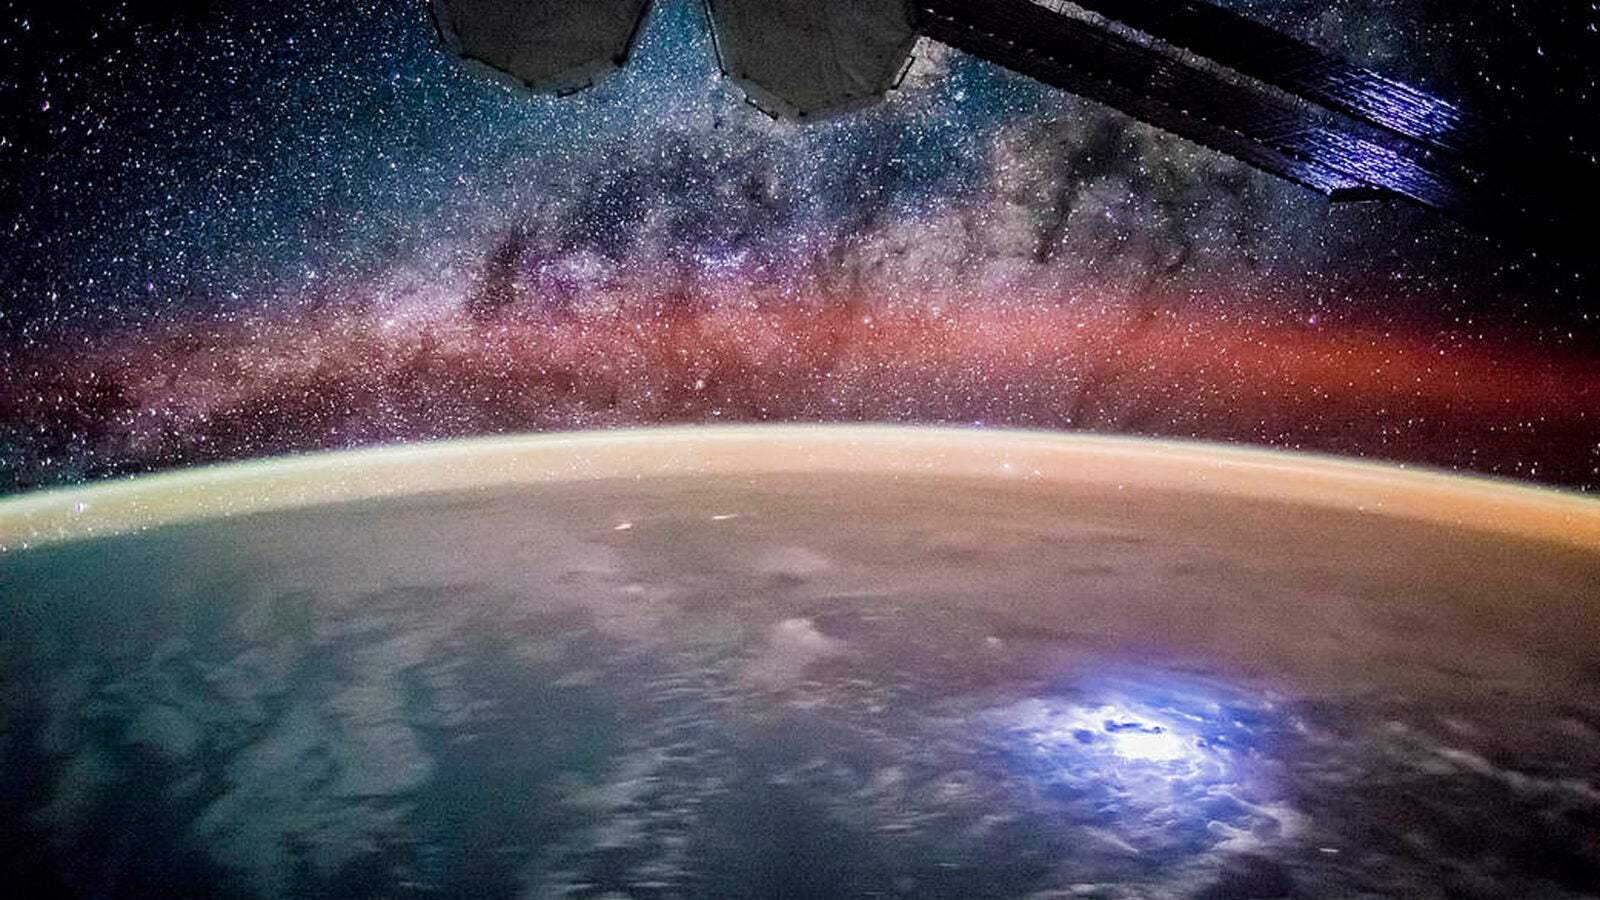 Earth's night lights.